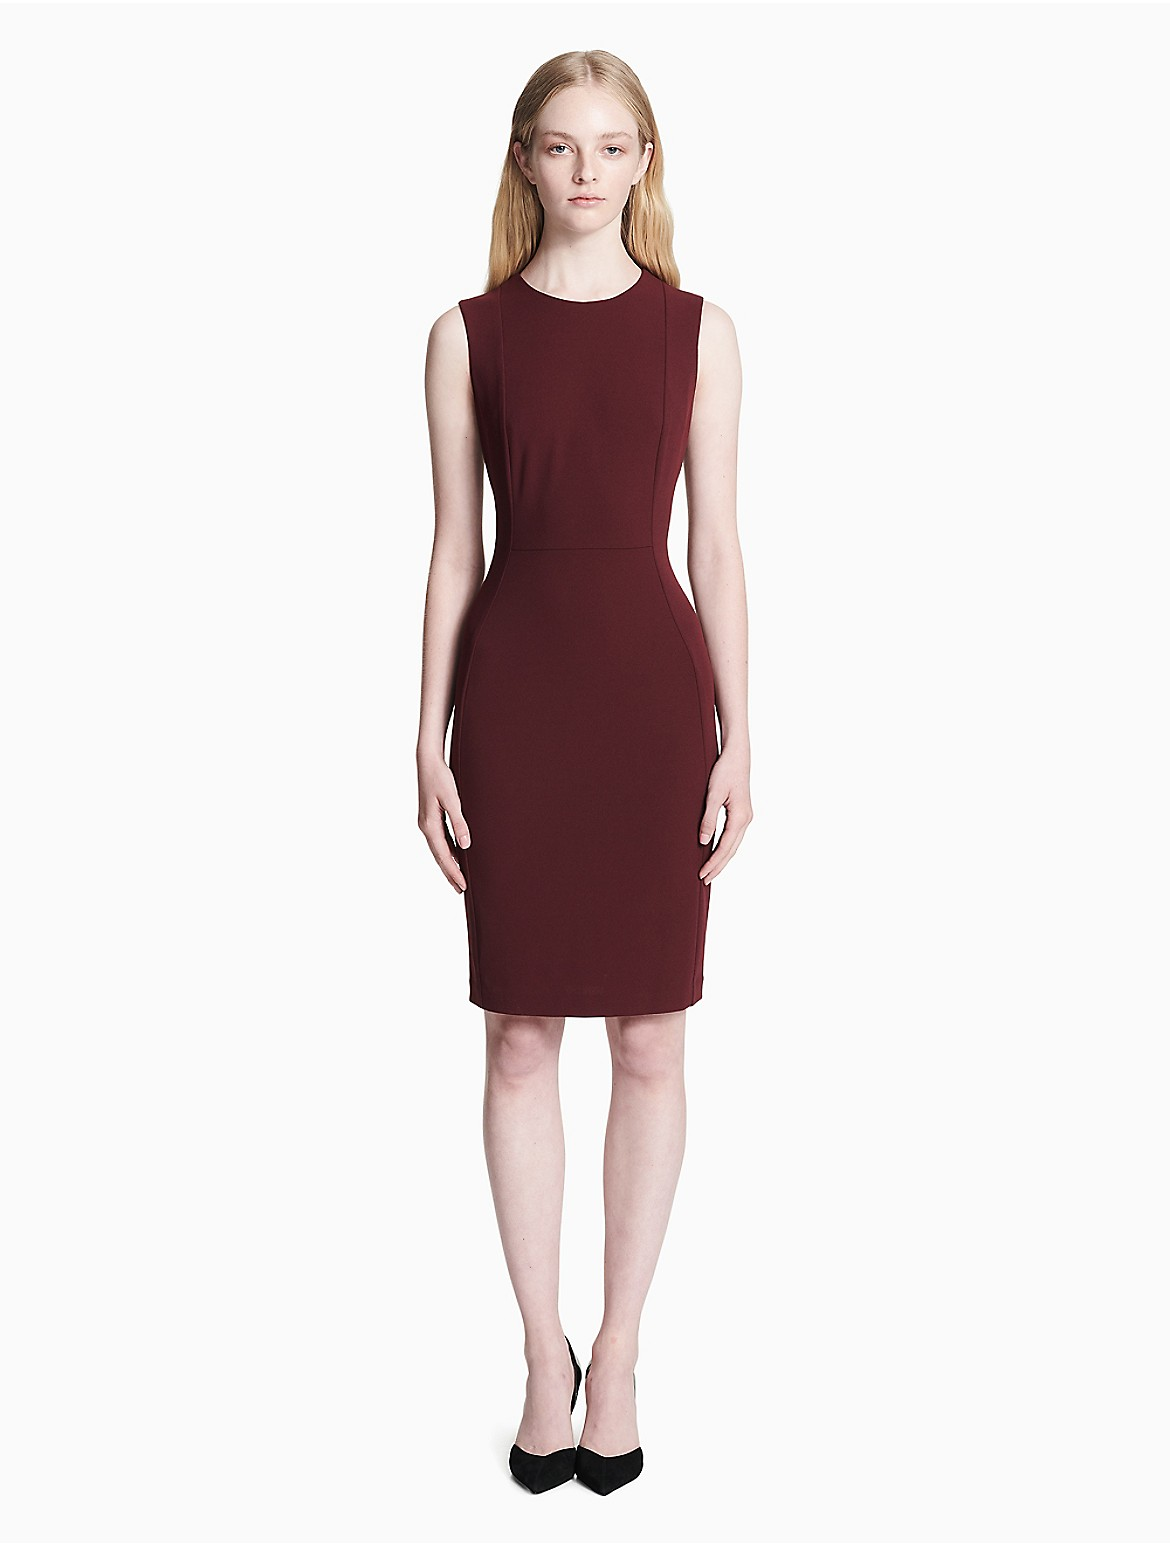 bde25c48b77 Womens Evening Dresses Macys - Gomes Weine AG